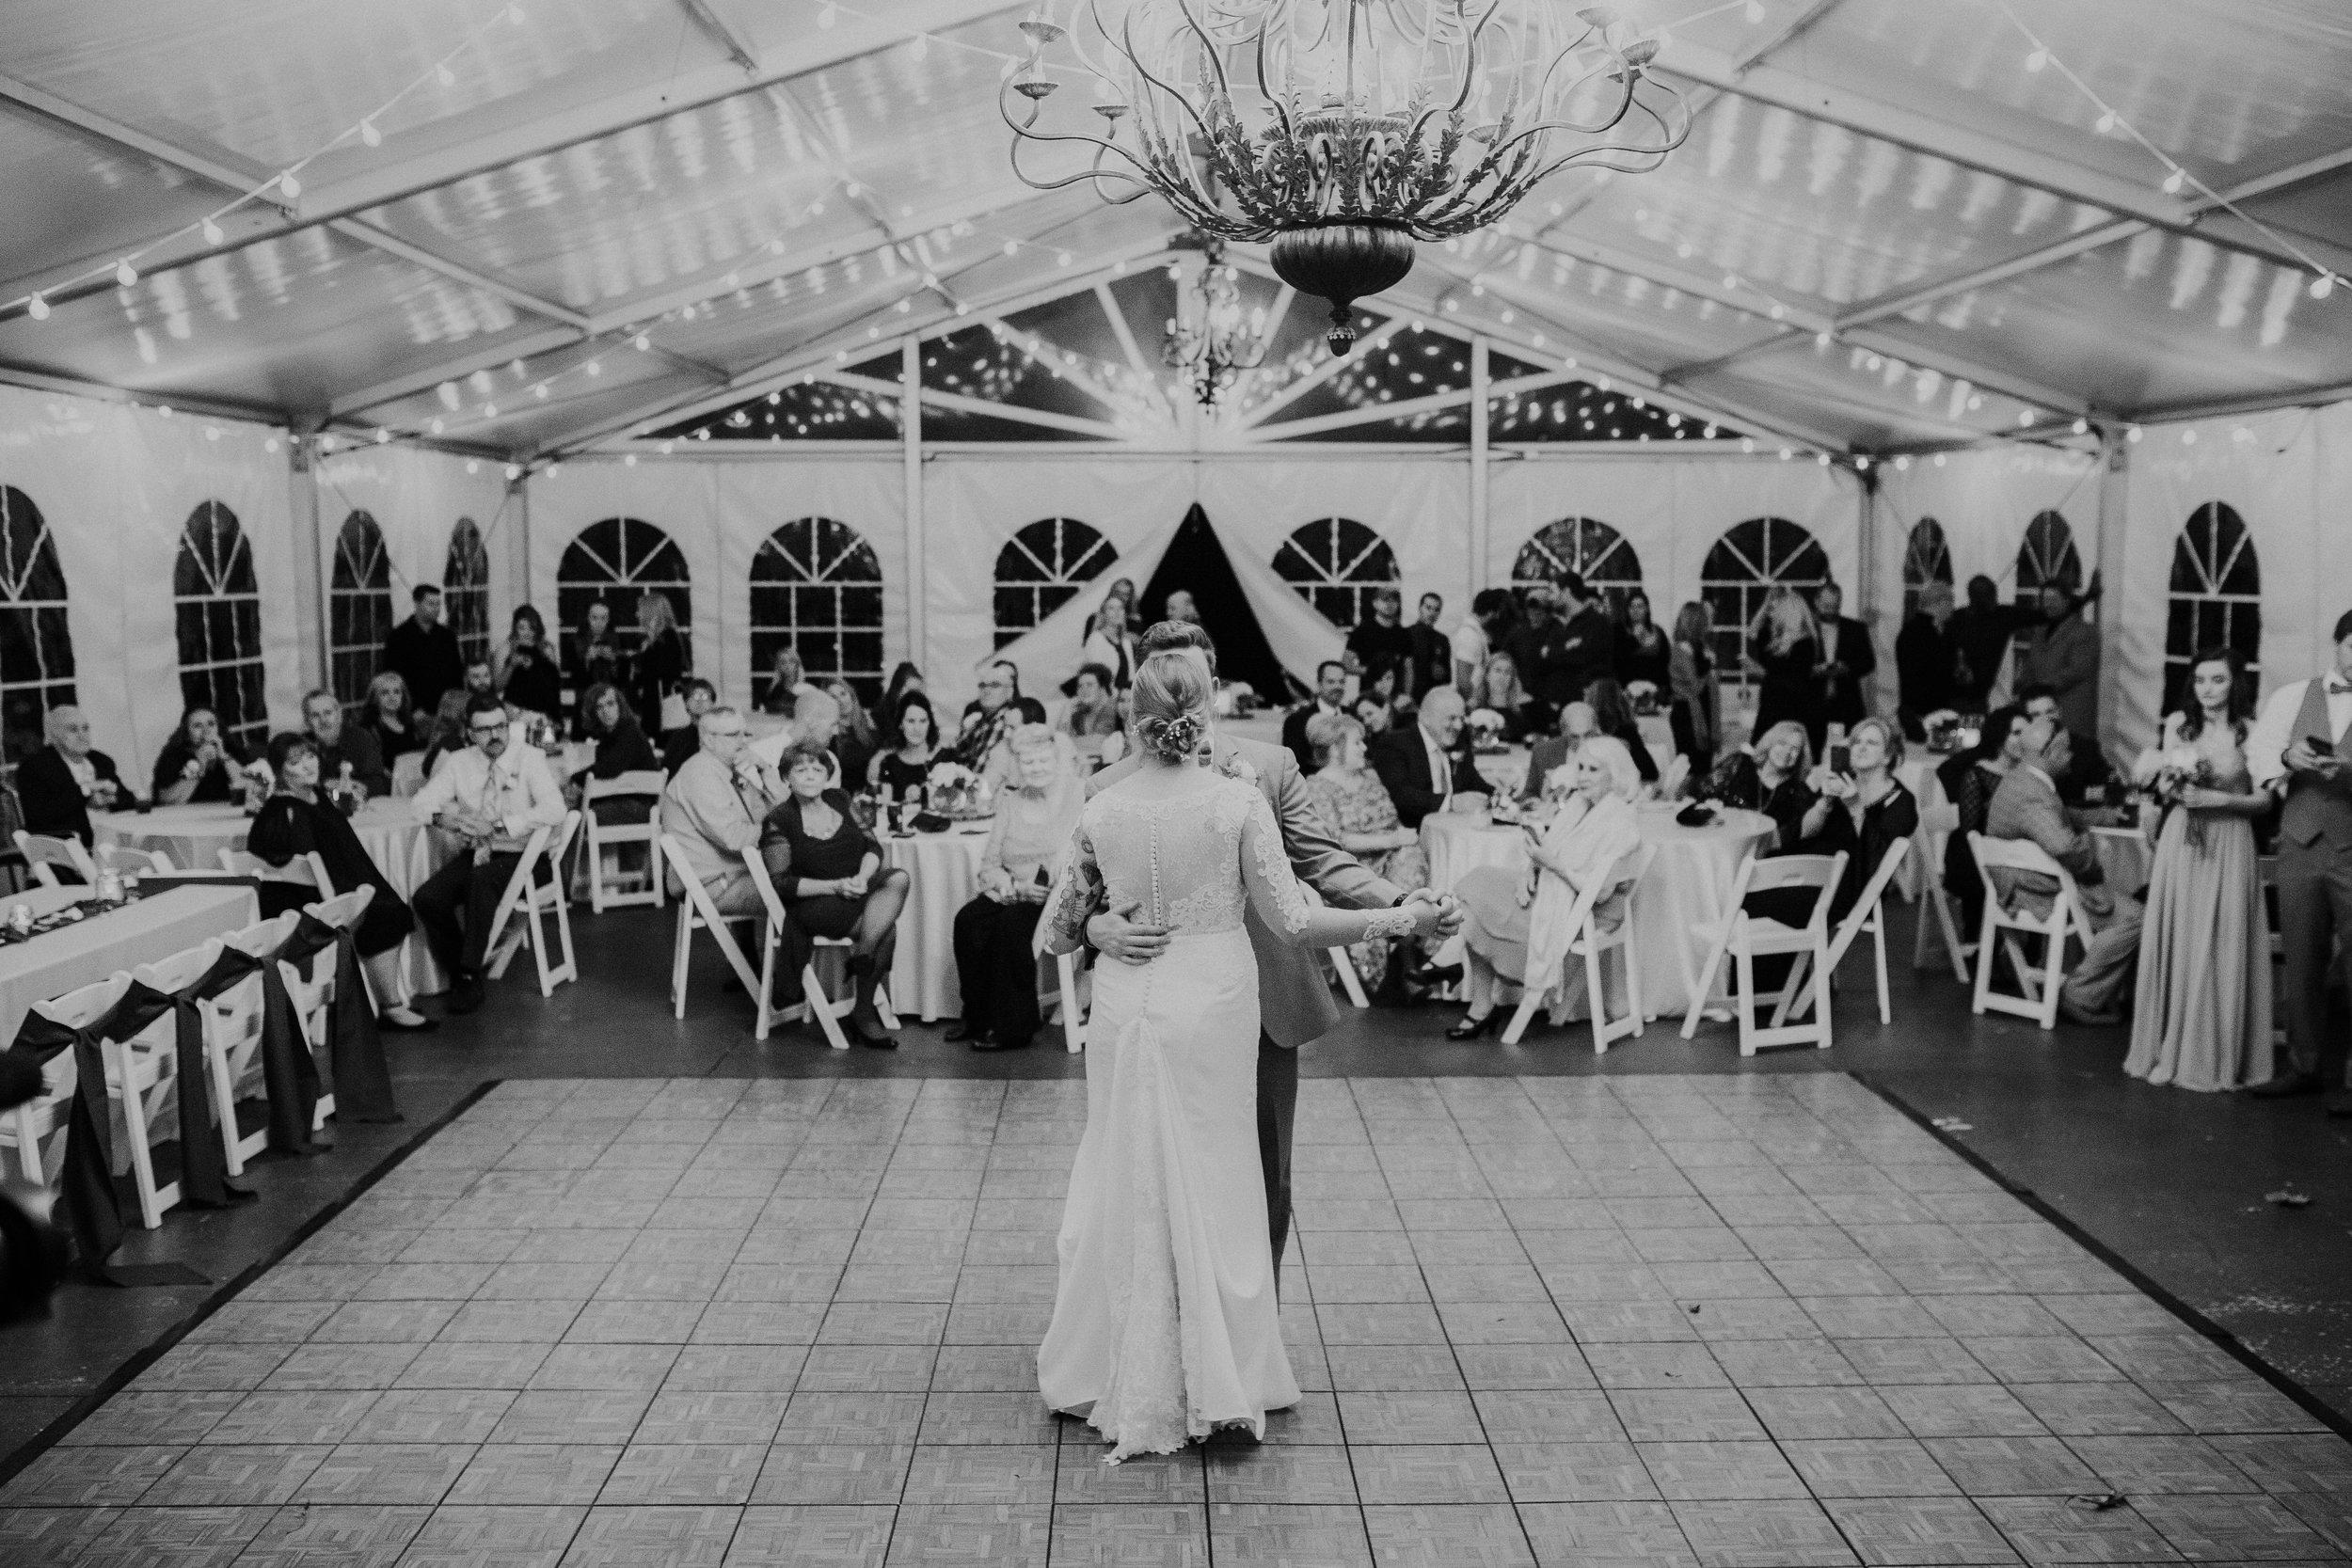 Gorgeous Wedding First Dance Photos - Dara's Garden Knoxville East Tennessee Wedding — The Overwhelmed Bride Wedding Blog